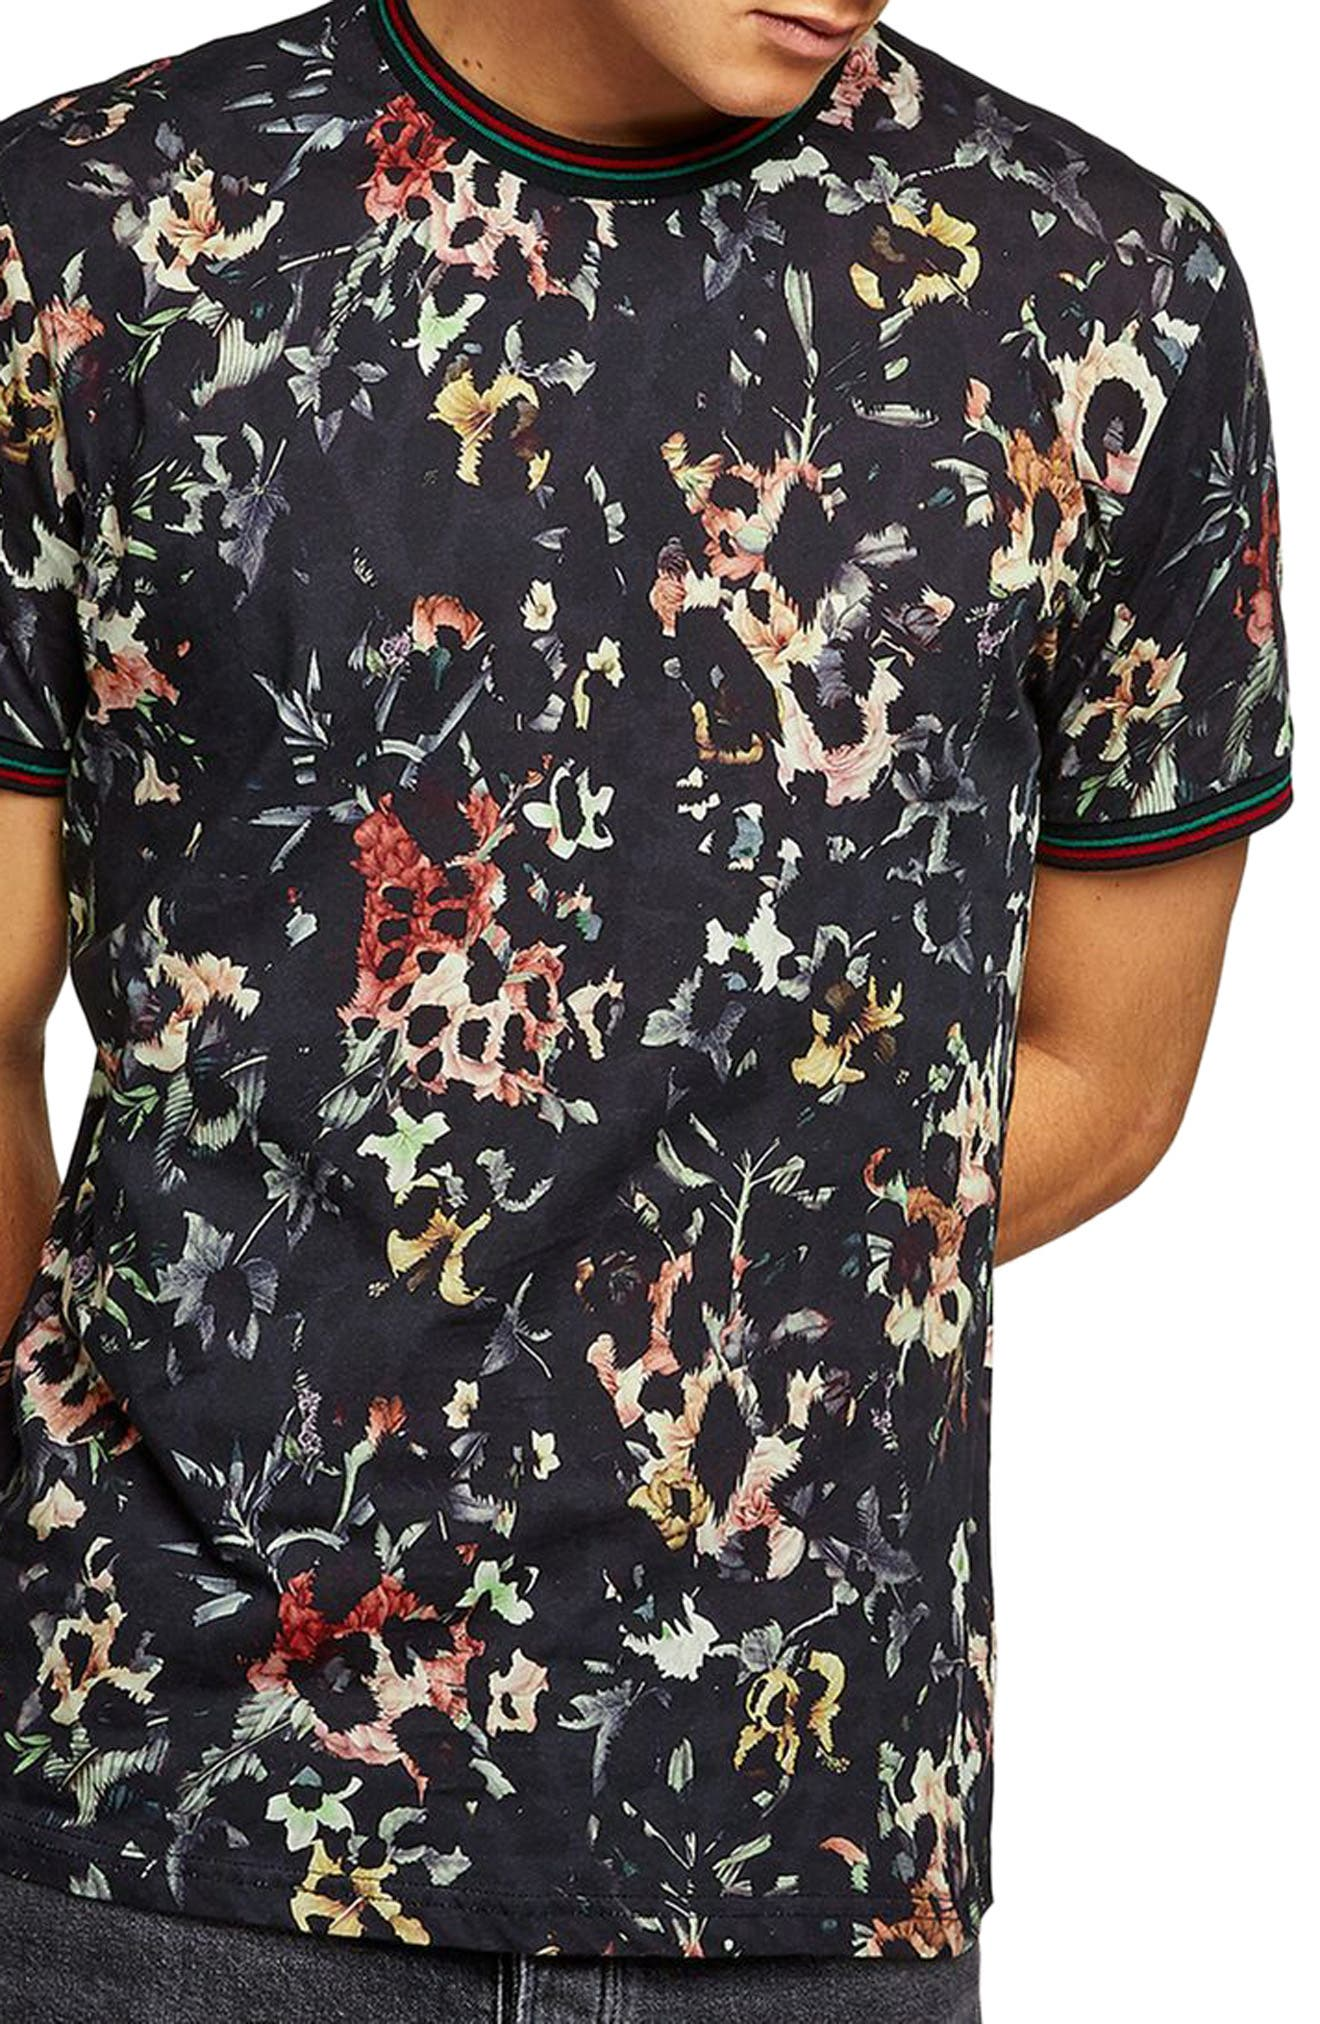 Floral Leopard Print T-Shirt,                             Main thumbnail 1, color,                             Black Multi